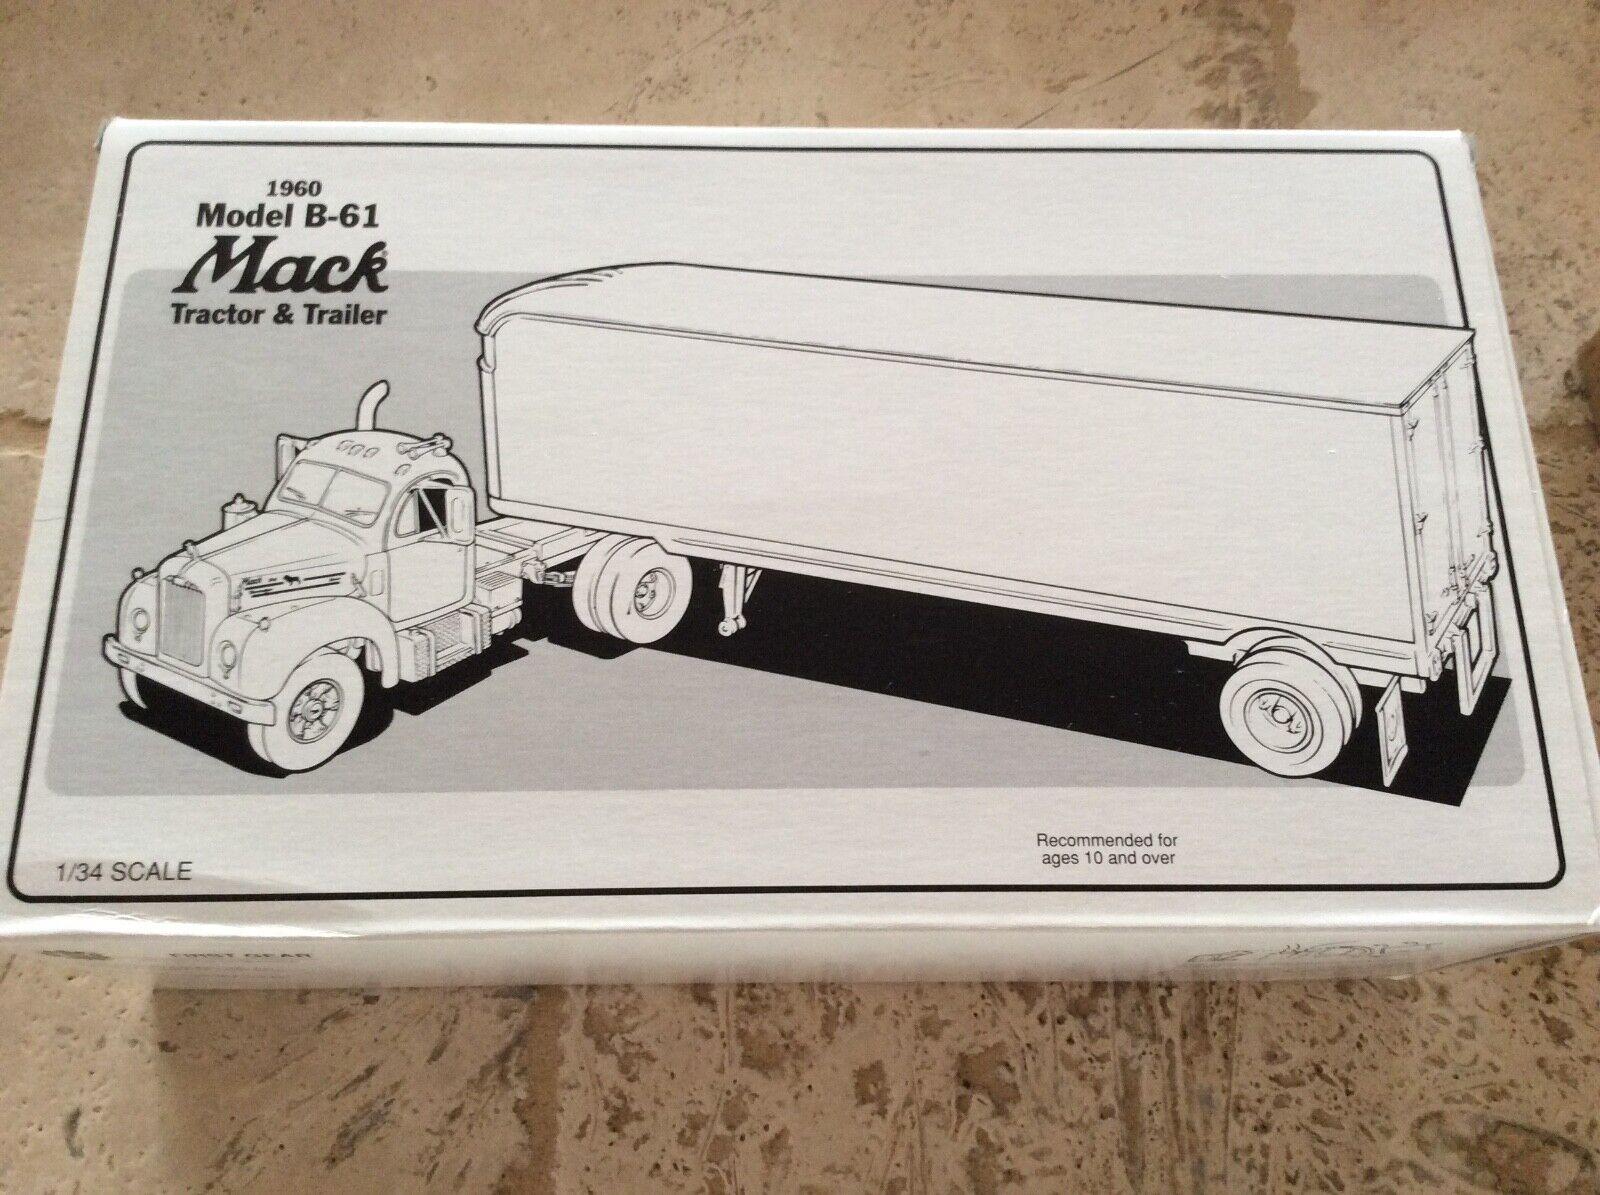 First Gear Mercer transporte 1960 Mack B-61 Tractor & Remolque 18-1397